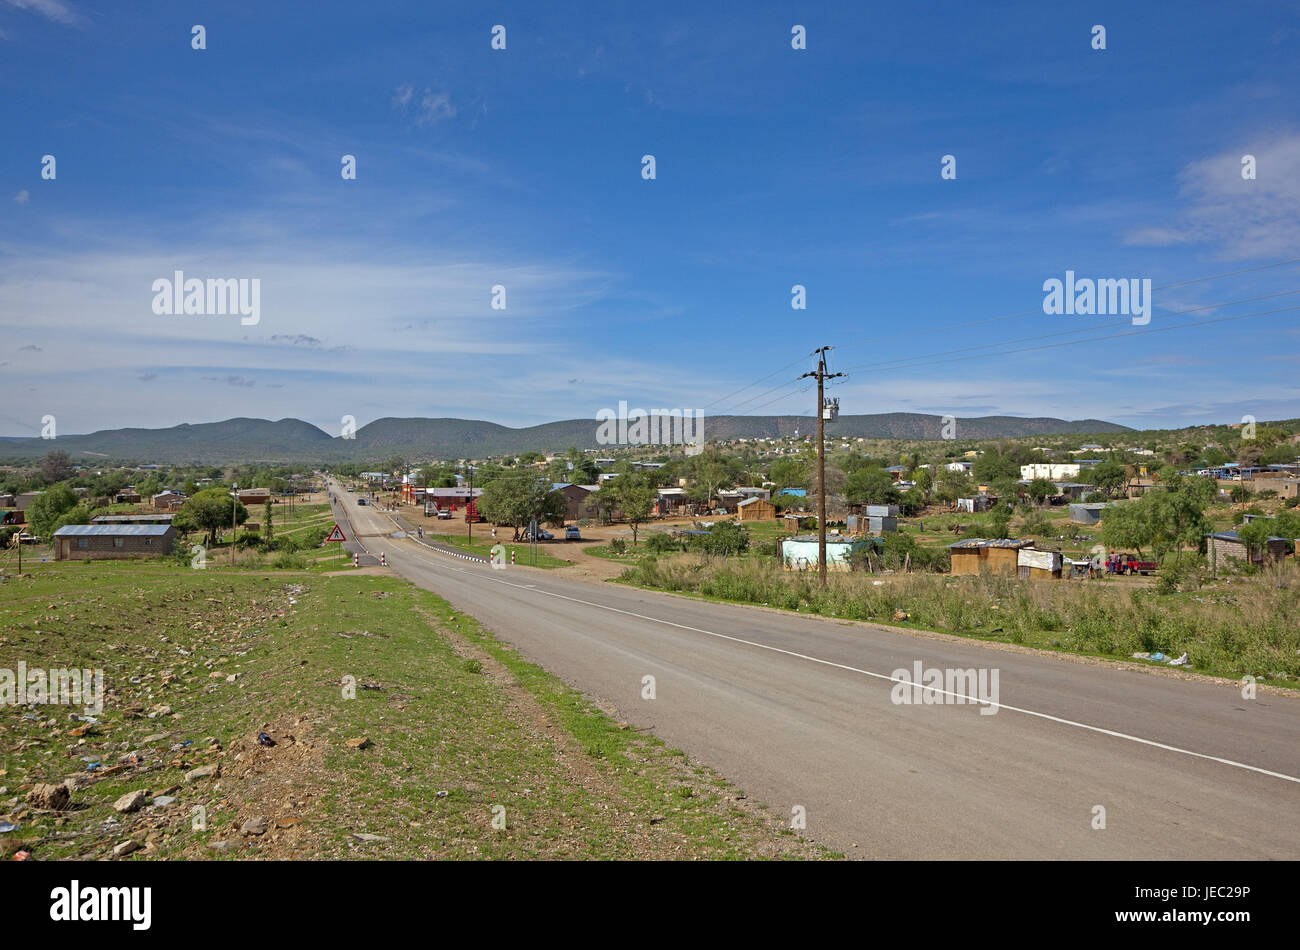 Africa, Namibia, Kunene region, Kaokoveld, Opuwo, street, nobody, South-West Africa, capital, town, Kuneneregion, - Stock Image